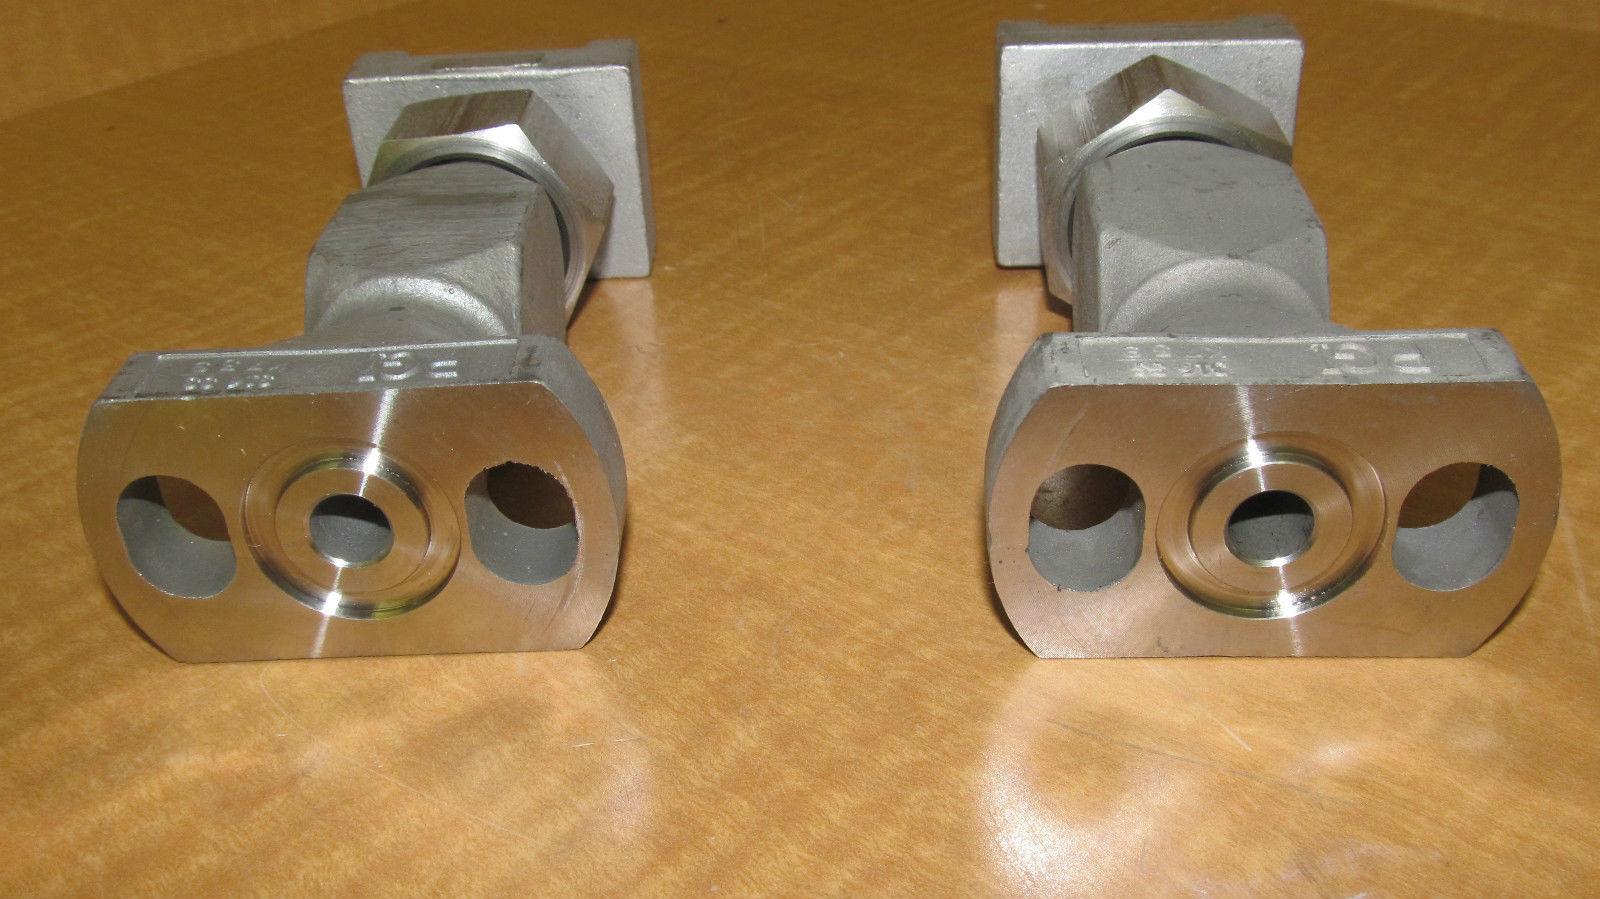 New pgi international stabilized connector flange kit ak